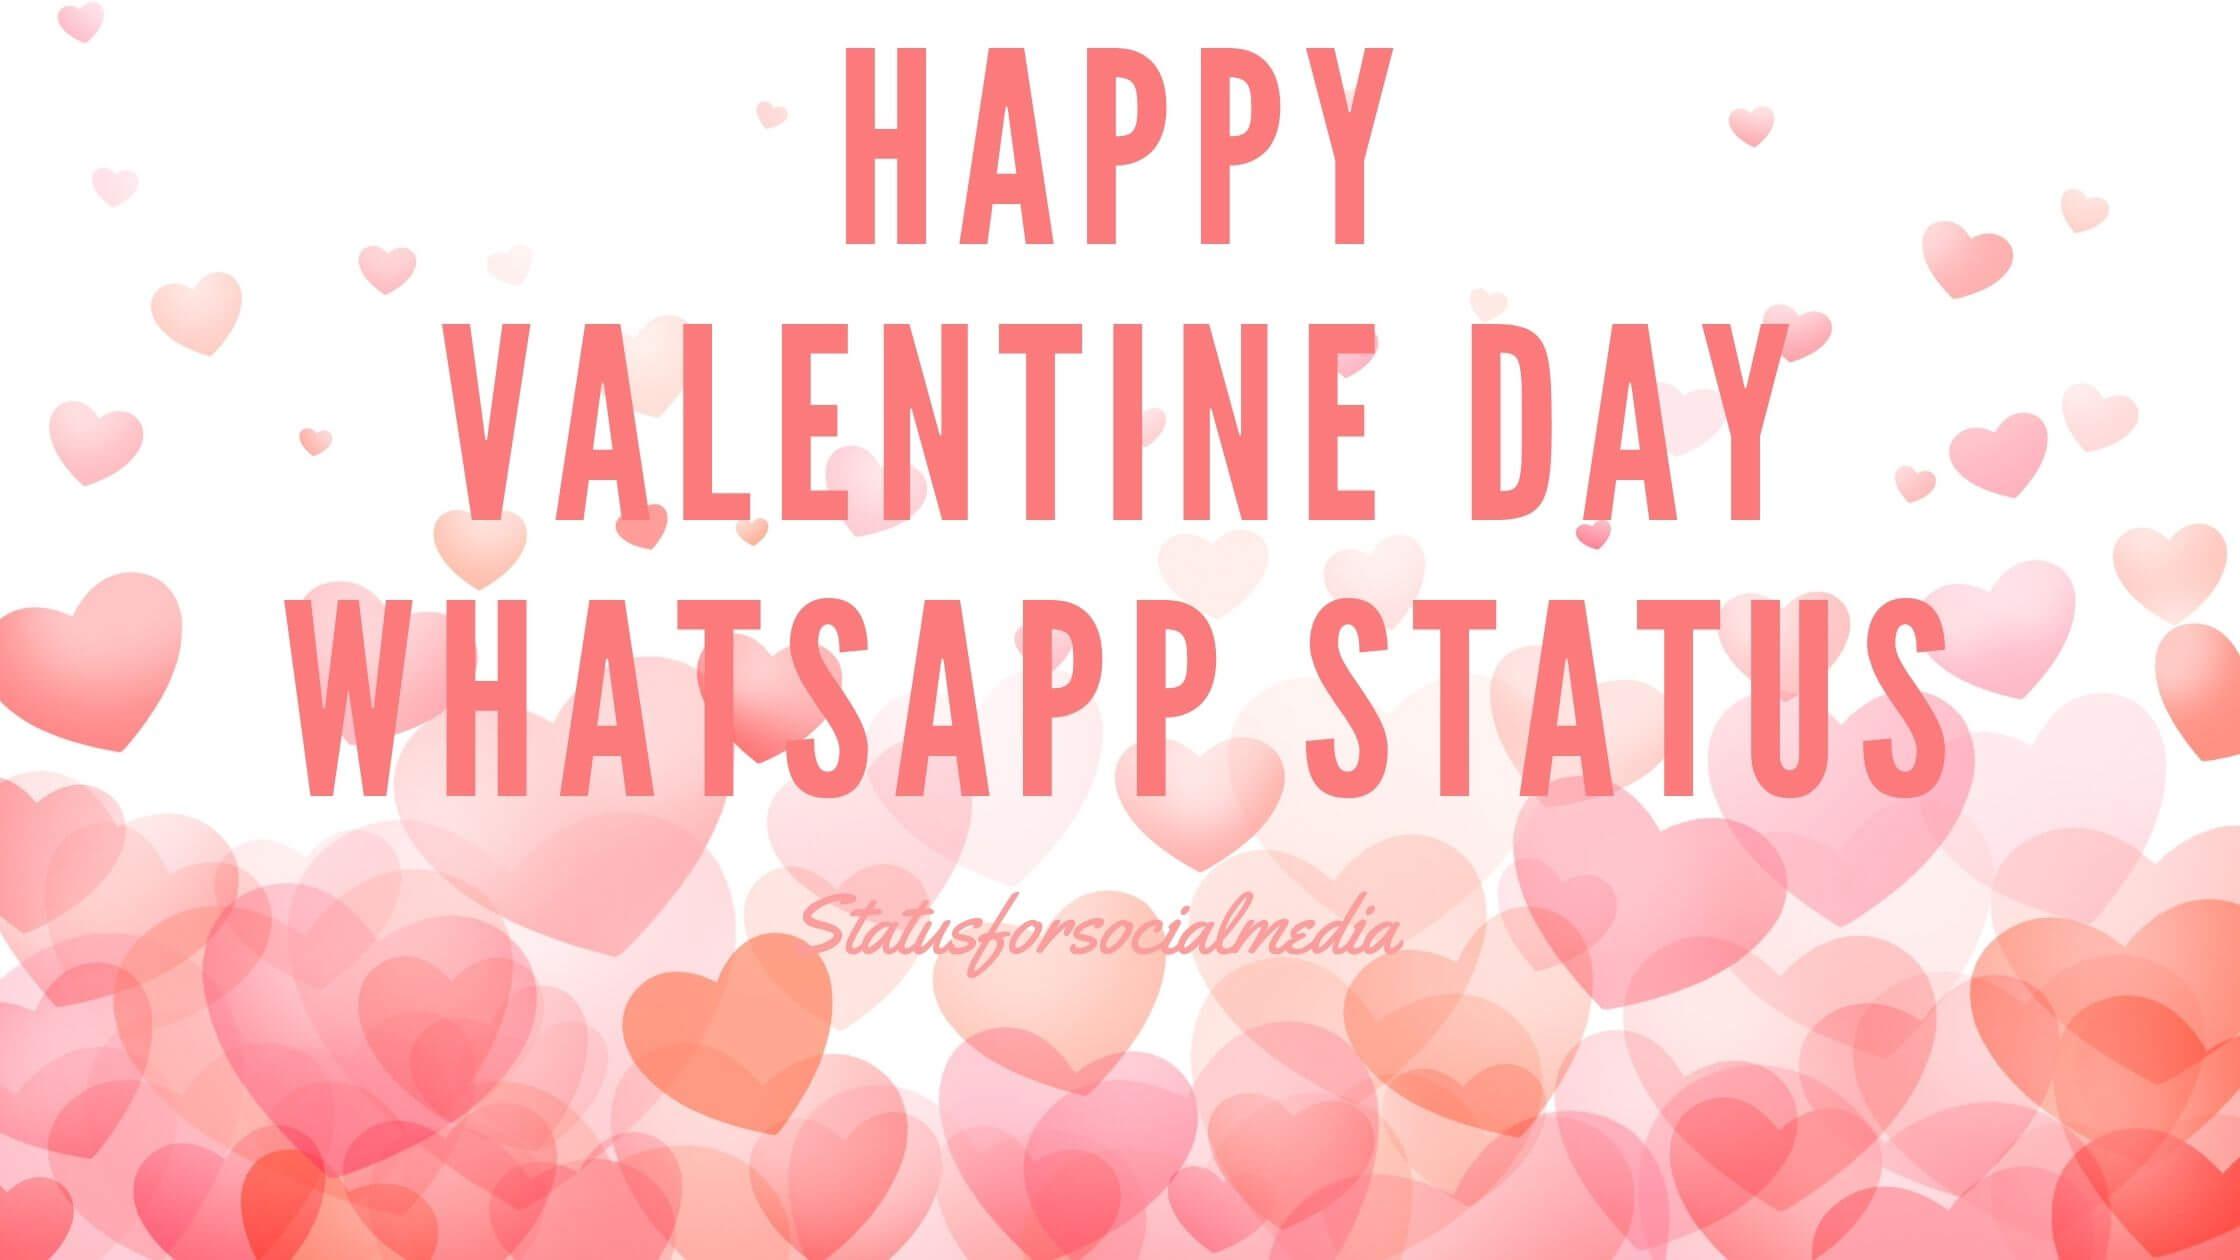 Happy Valentine Day WhatsApp Status Video